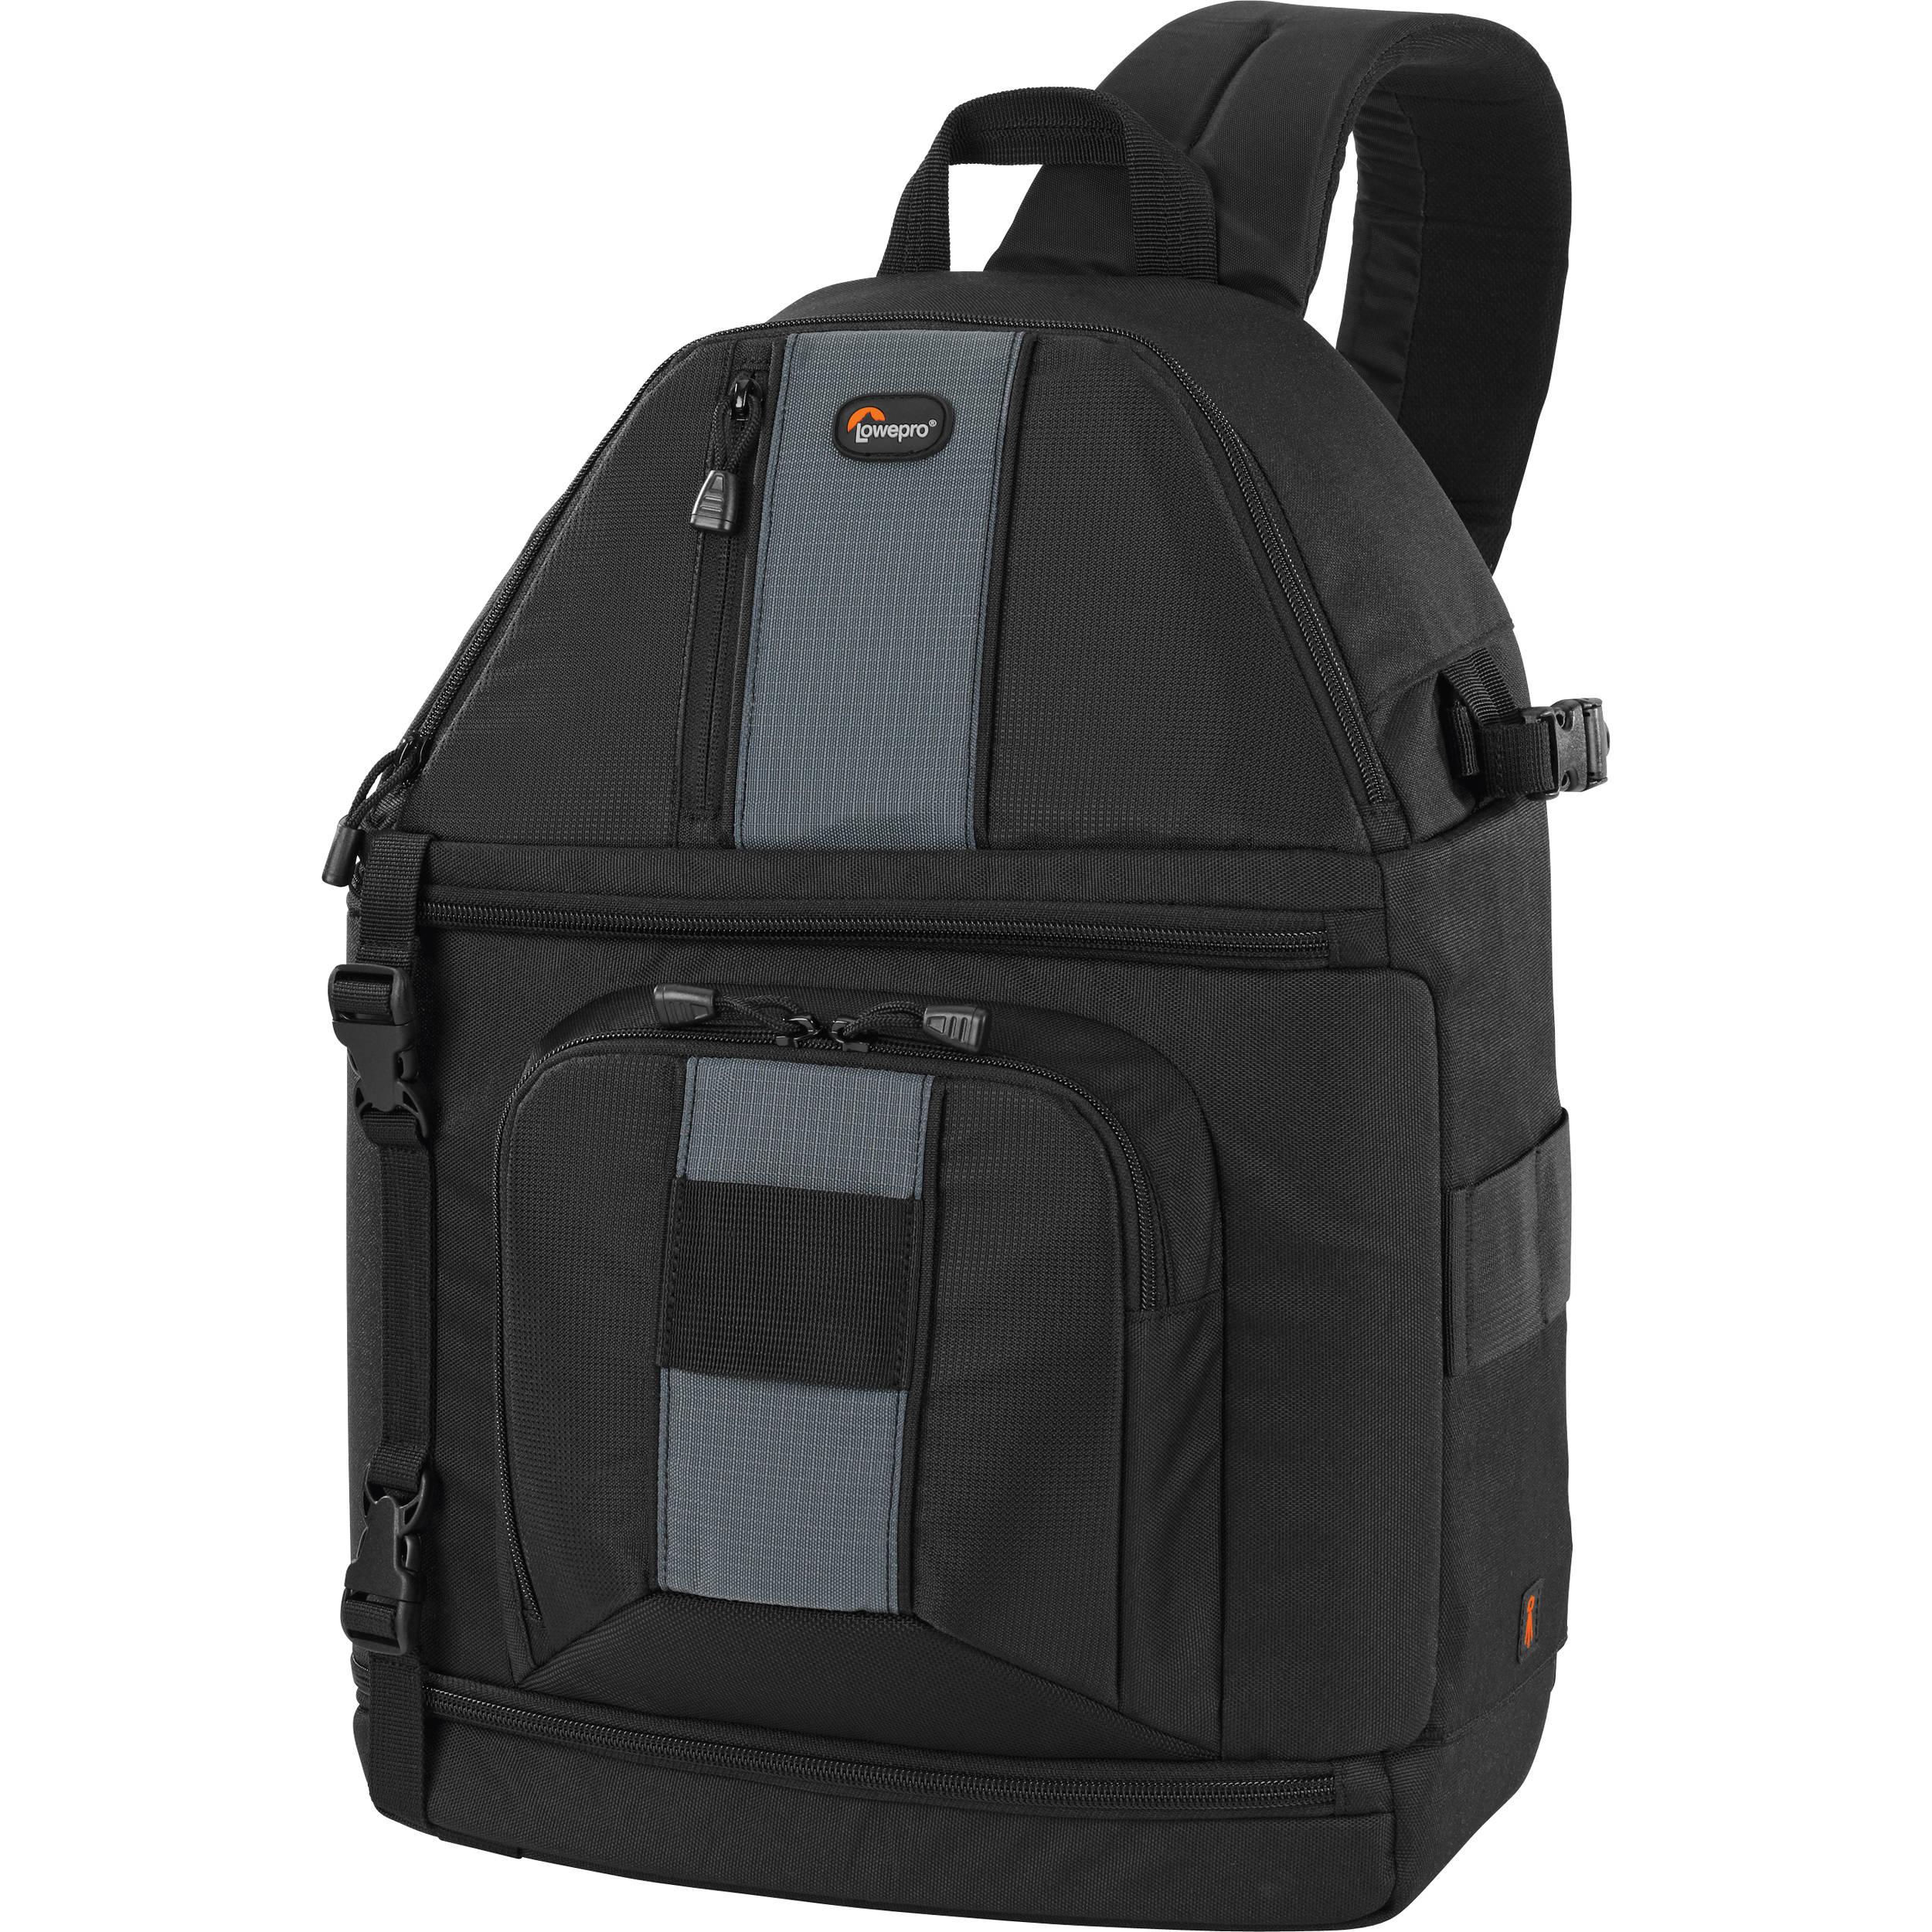 Lowepro SlingShot 302 AW Camera Bag LP36174 B&H Photo Video